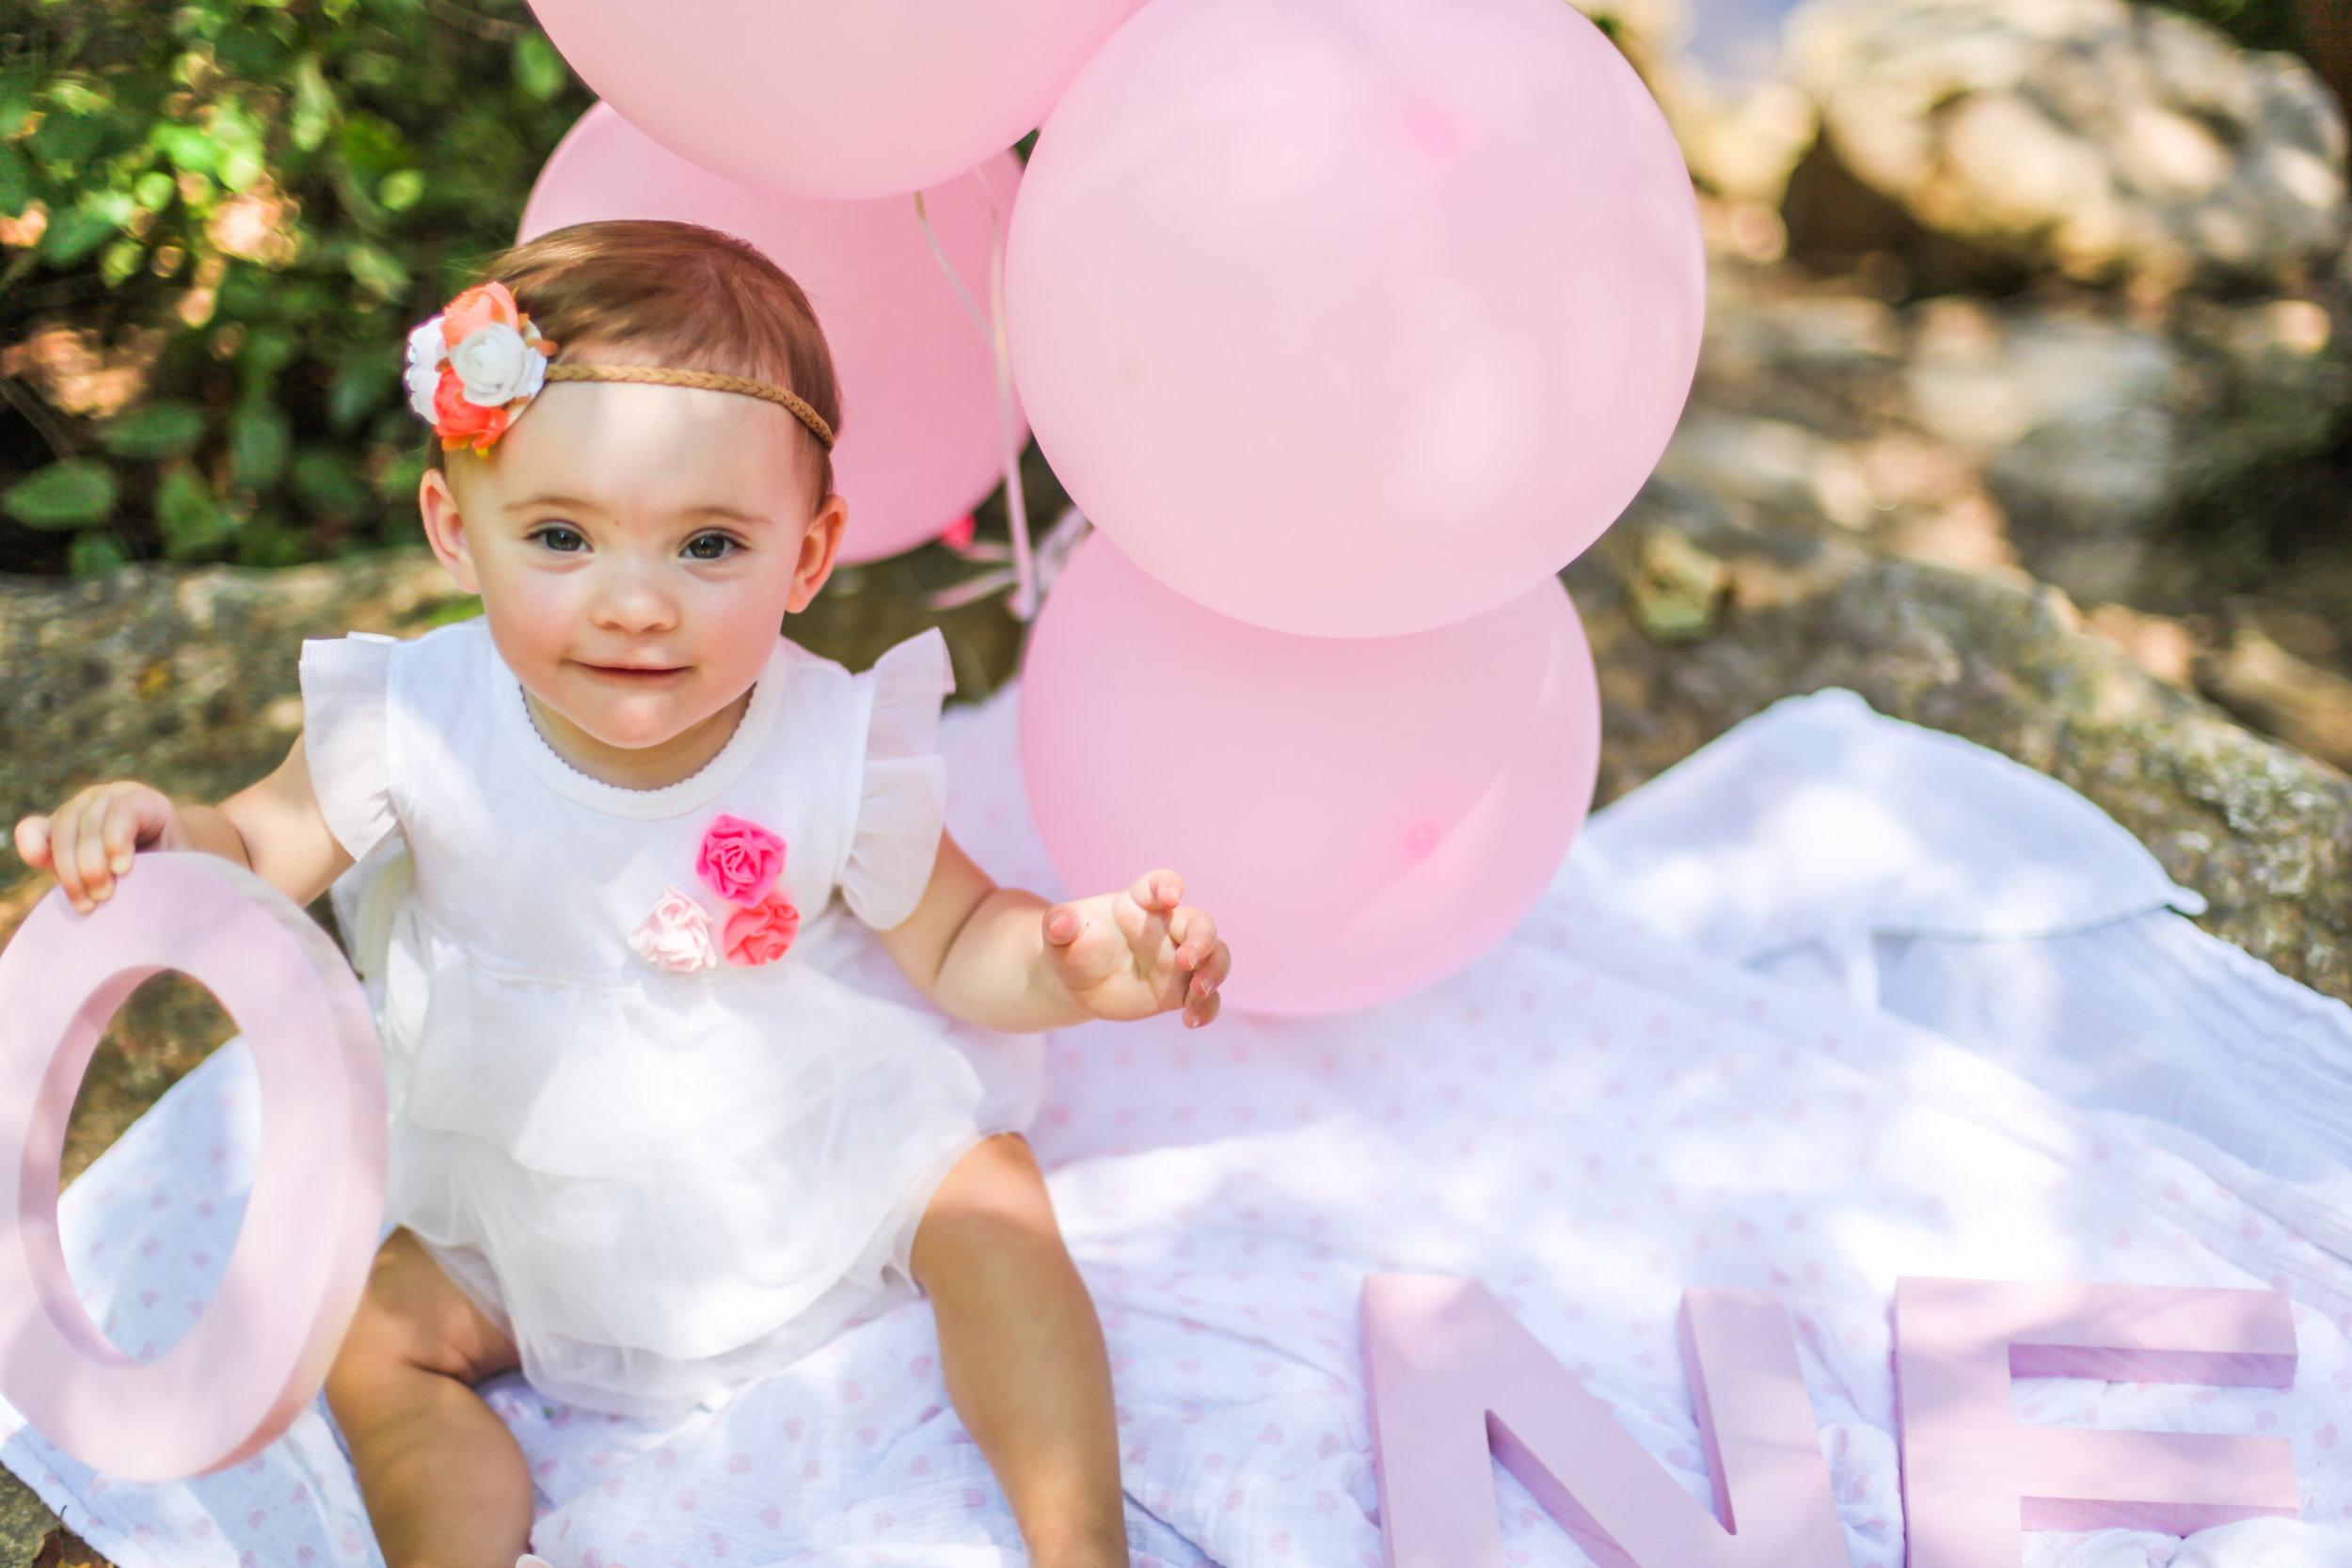 woodstock baby photography angela elliott-82.jpg